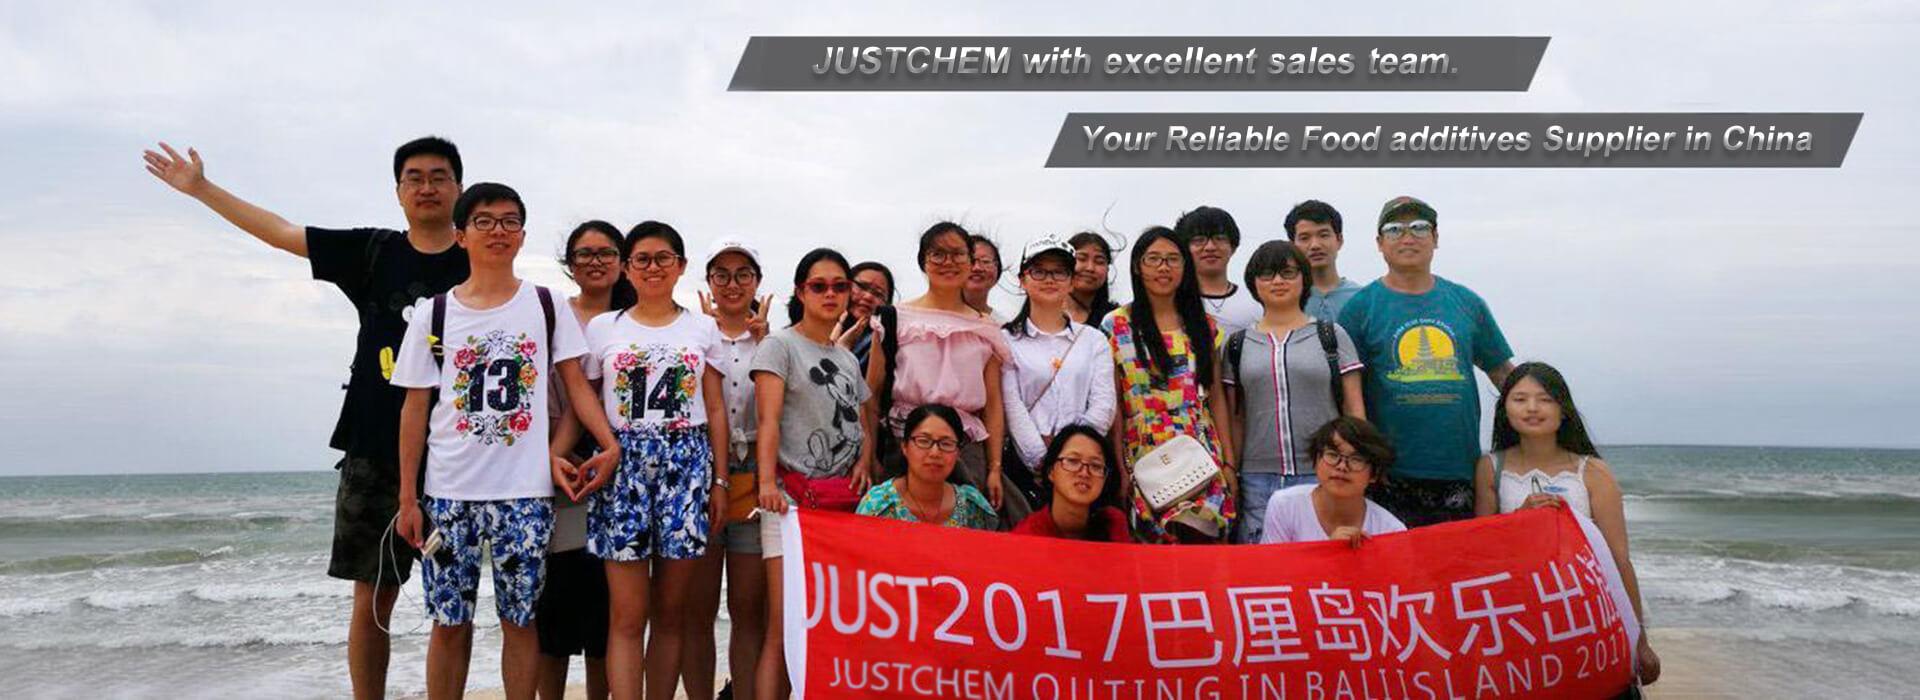 Justchem Team